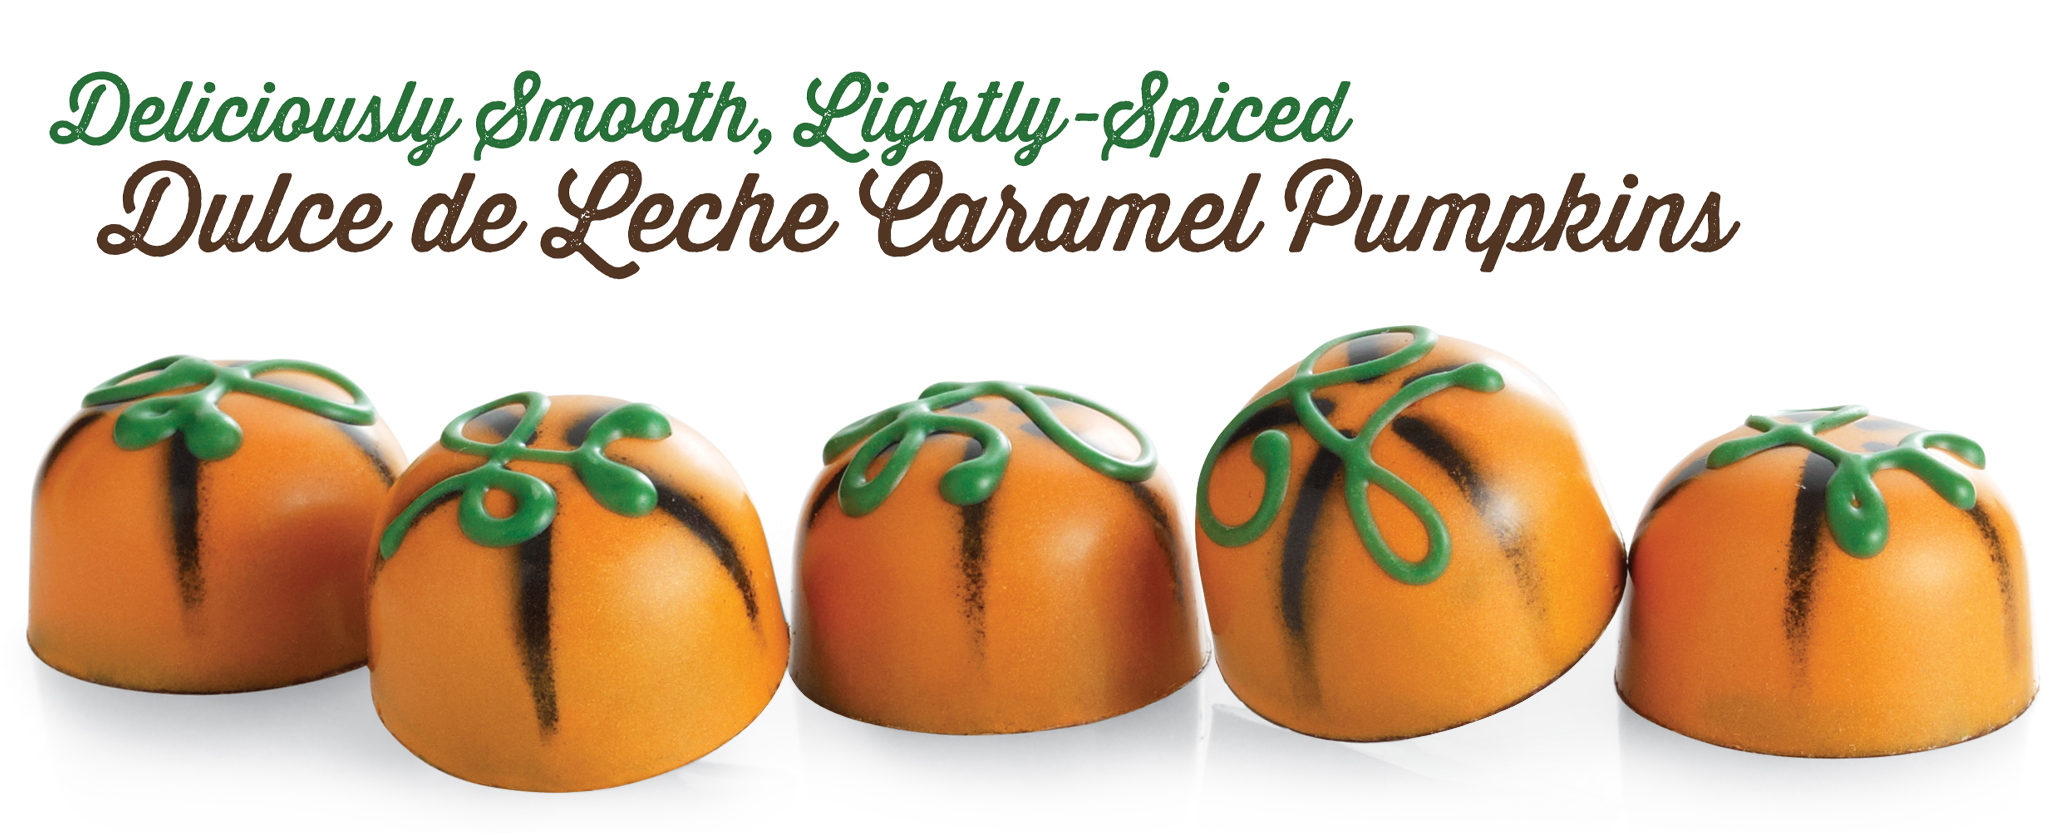 Caramel Pumpkins